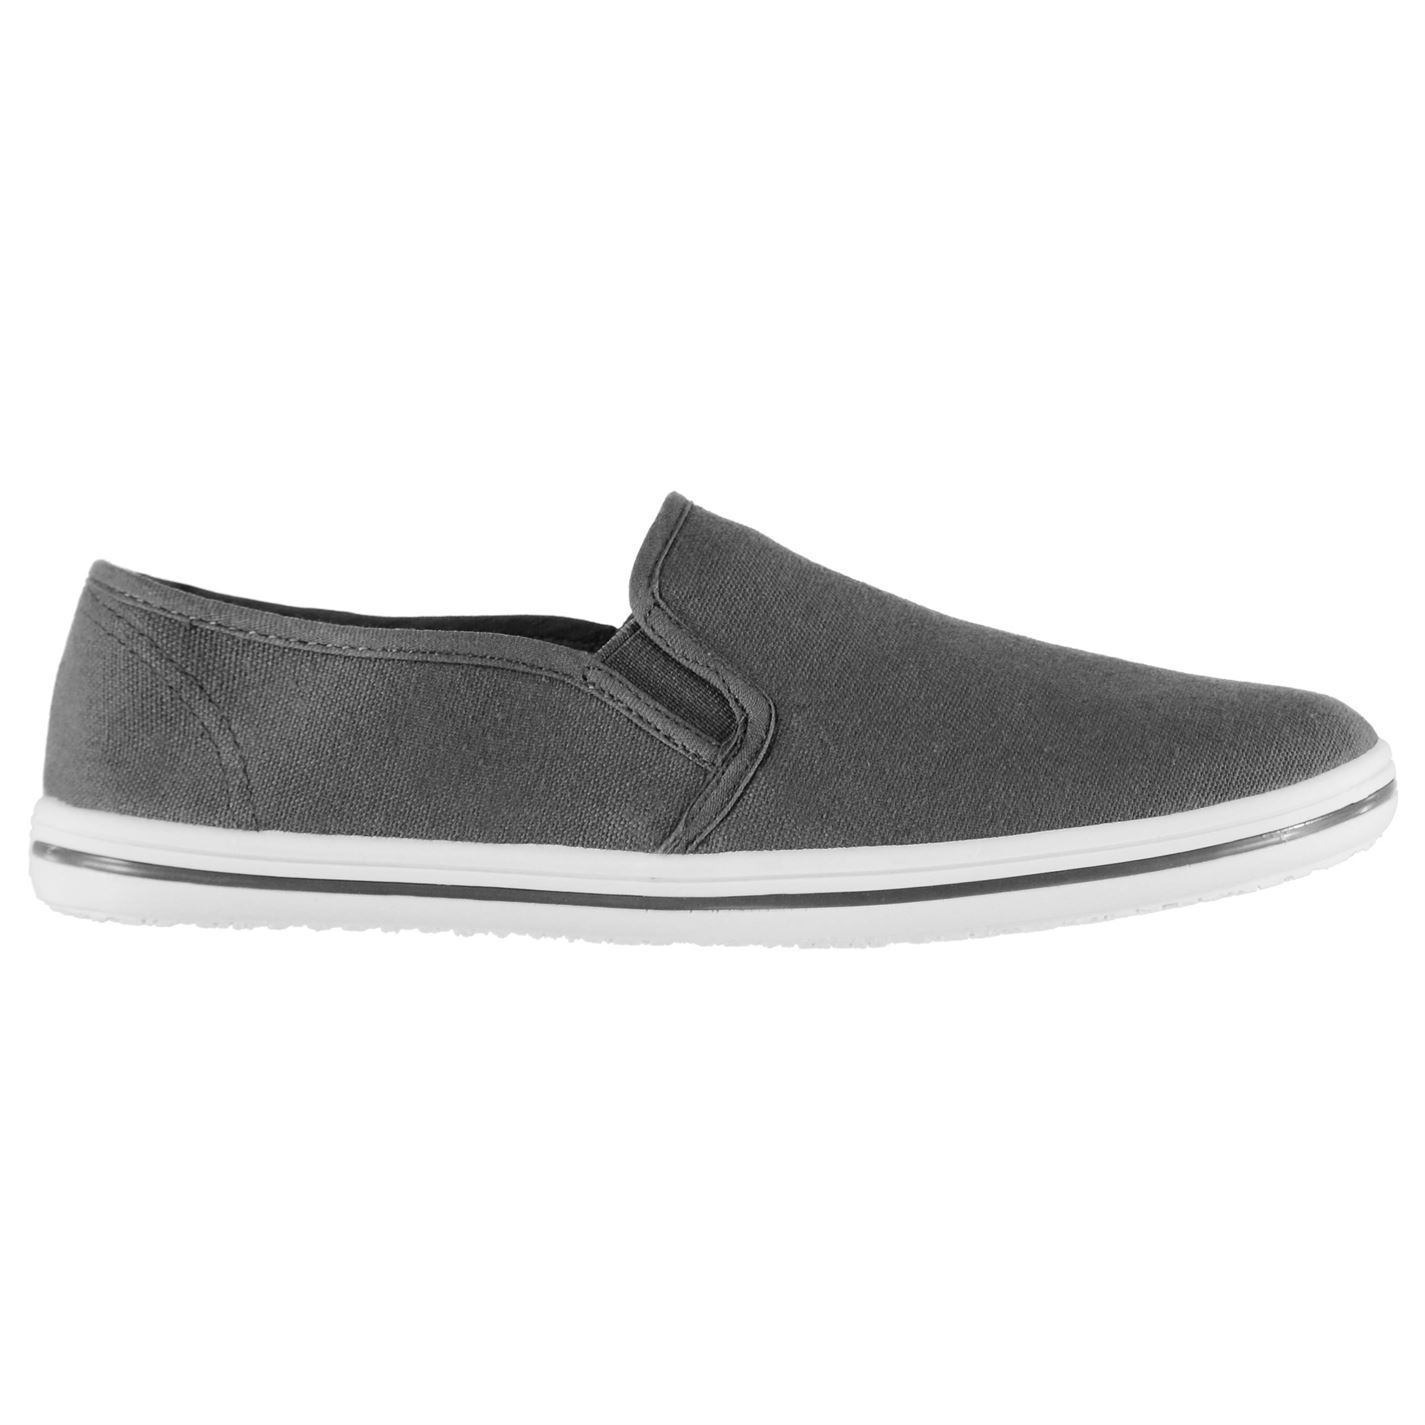 Slazenger Filles Toile à Enfiler Chaussures Baskets Chaussures